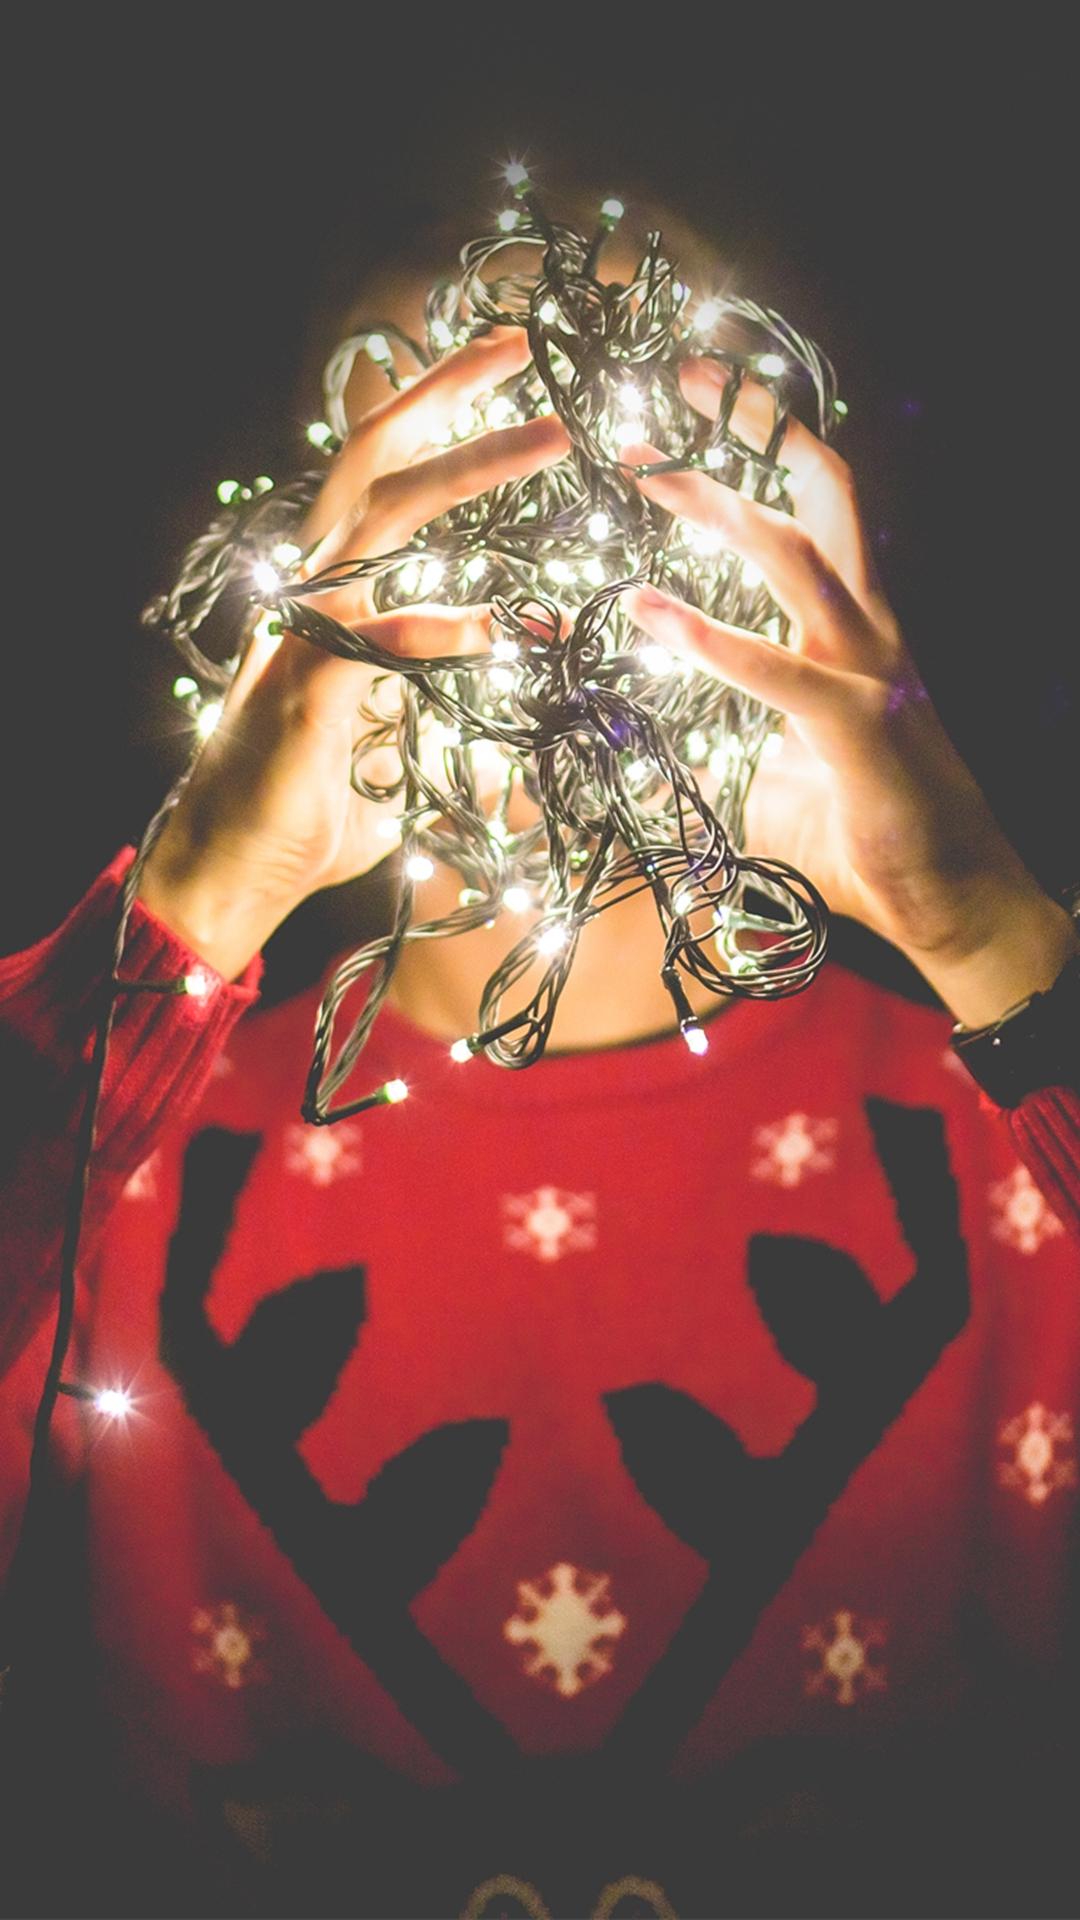 Christmas Lights Reindeer Sweater iPhone 8 Wallpapers Free